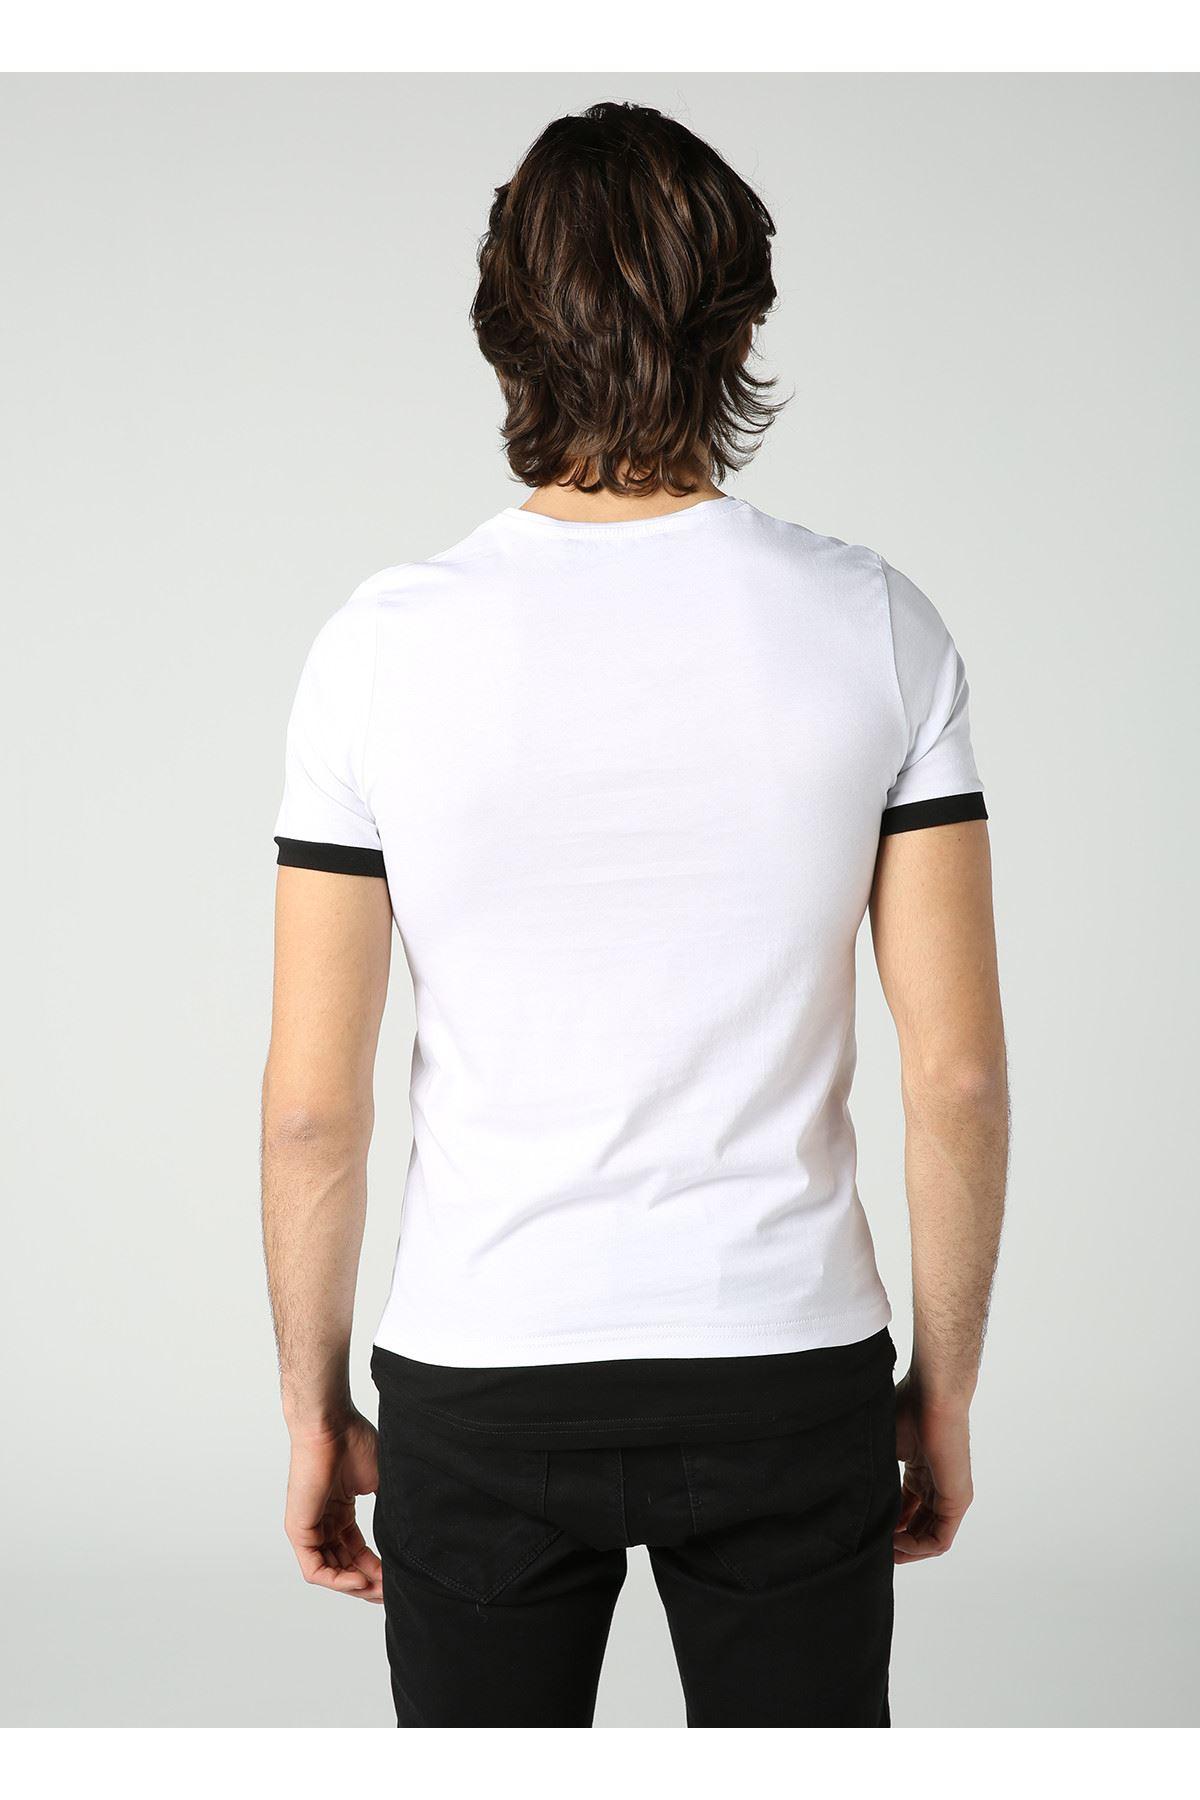 Bisiklet Yaka Kuru Kafa Baskılı Erkek Beyaz T-Shirt